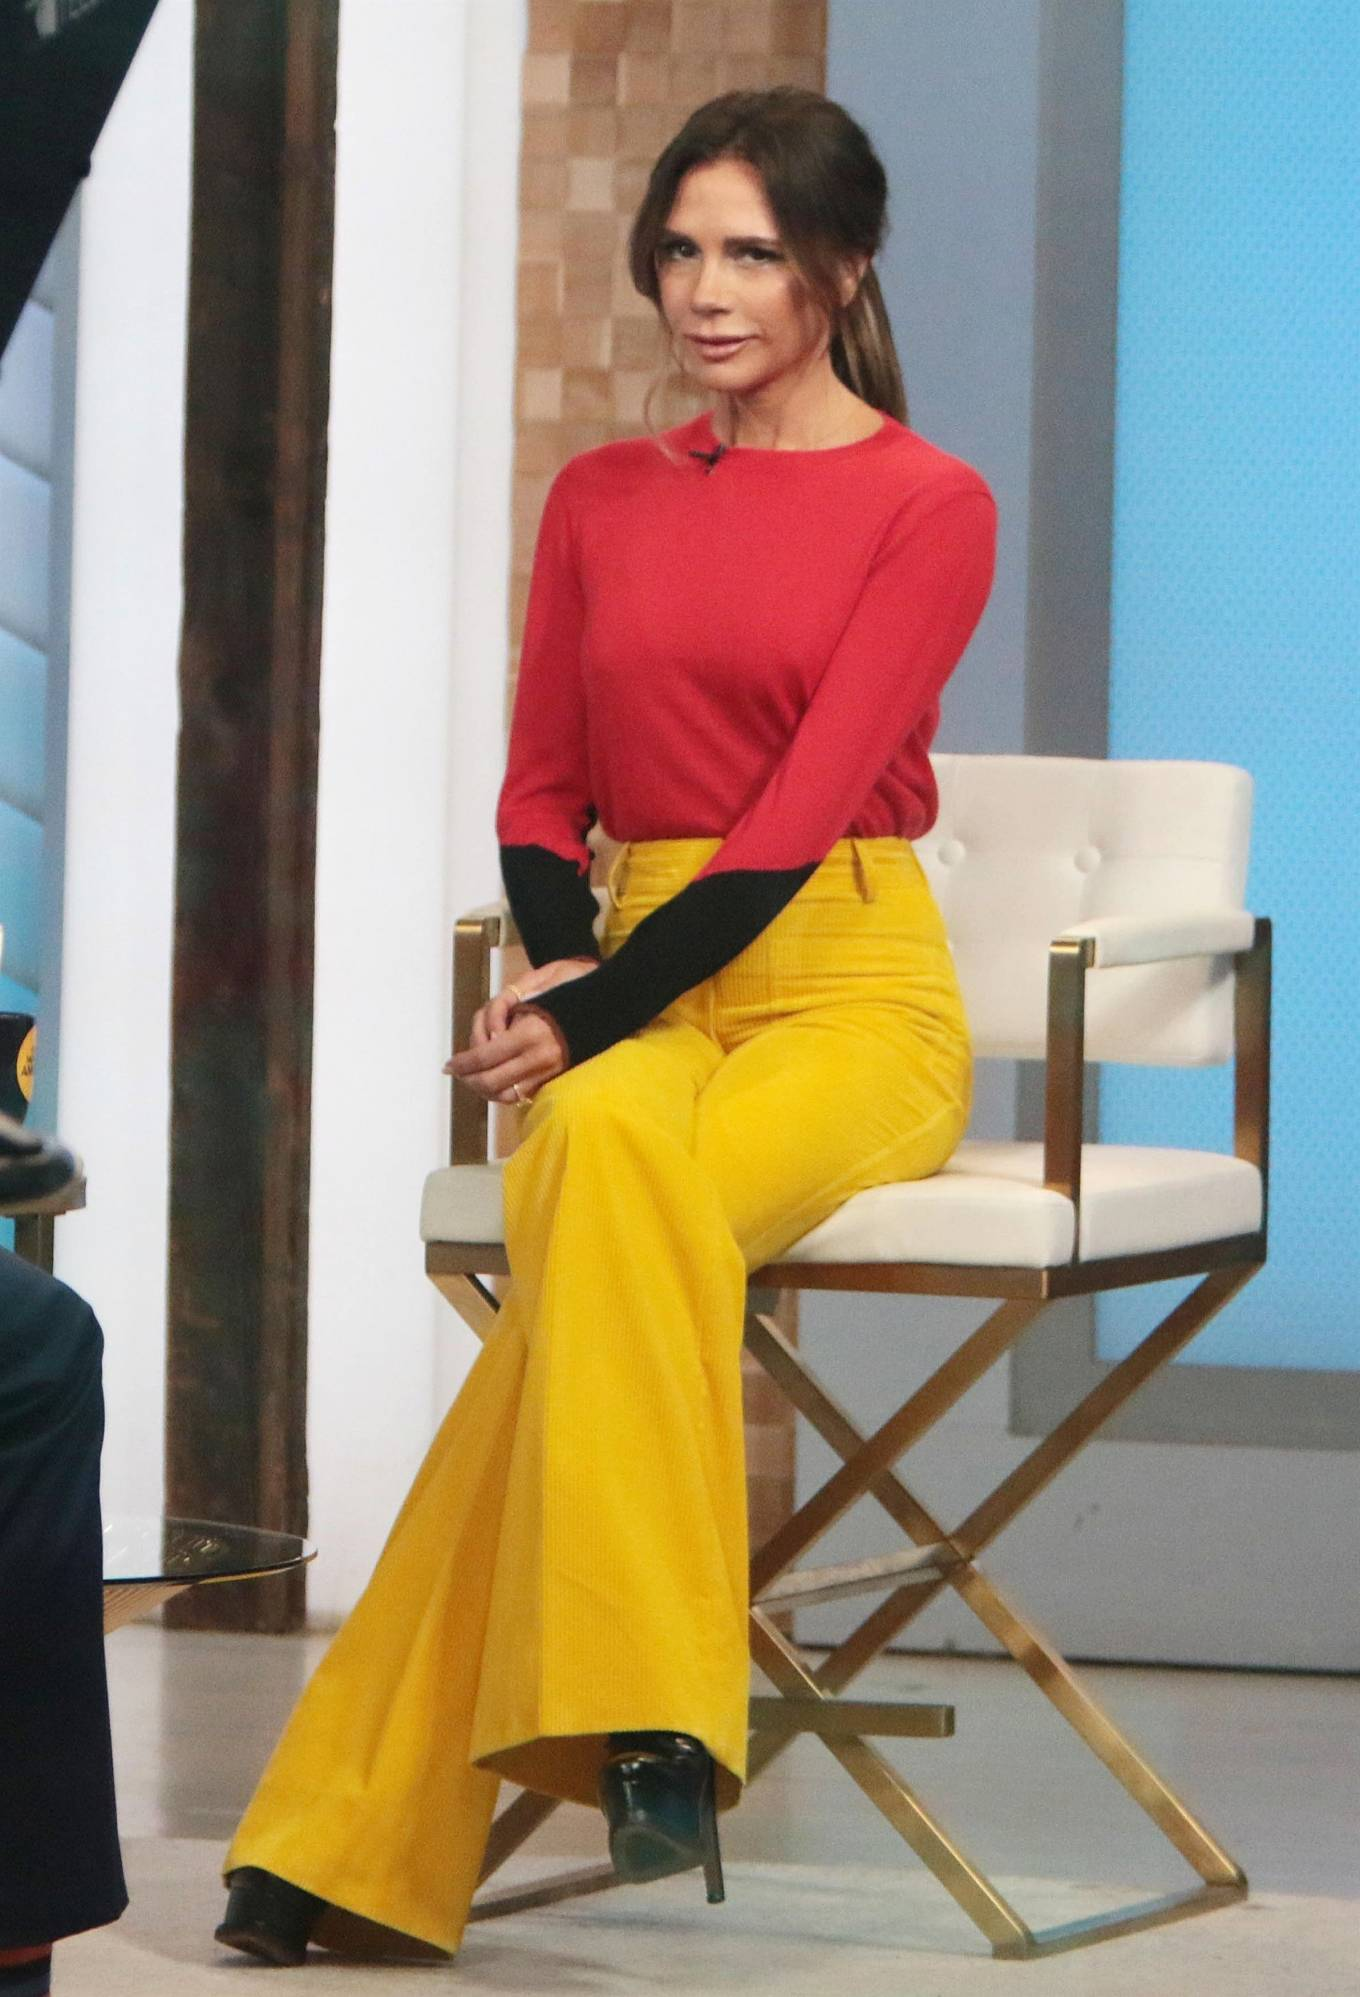 Victoria Beckham 2021 : Victoria Beckham – on Good Morning America promoting her new designer clothing in New York City-12